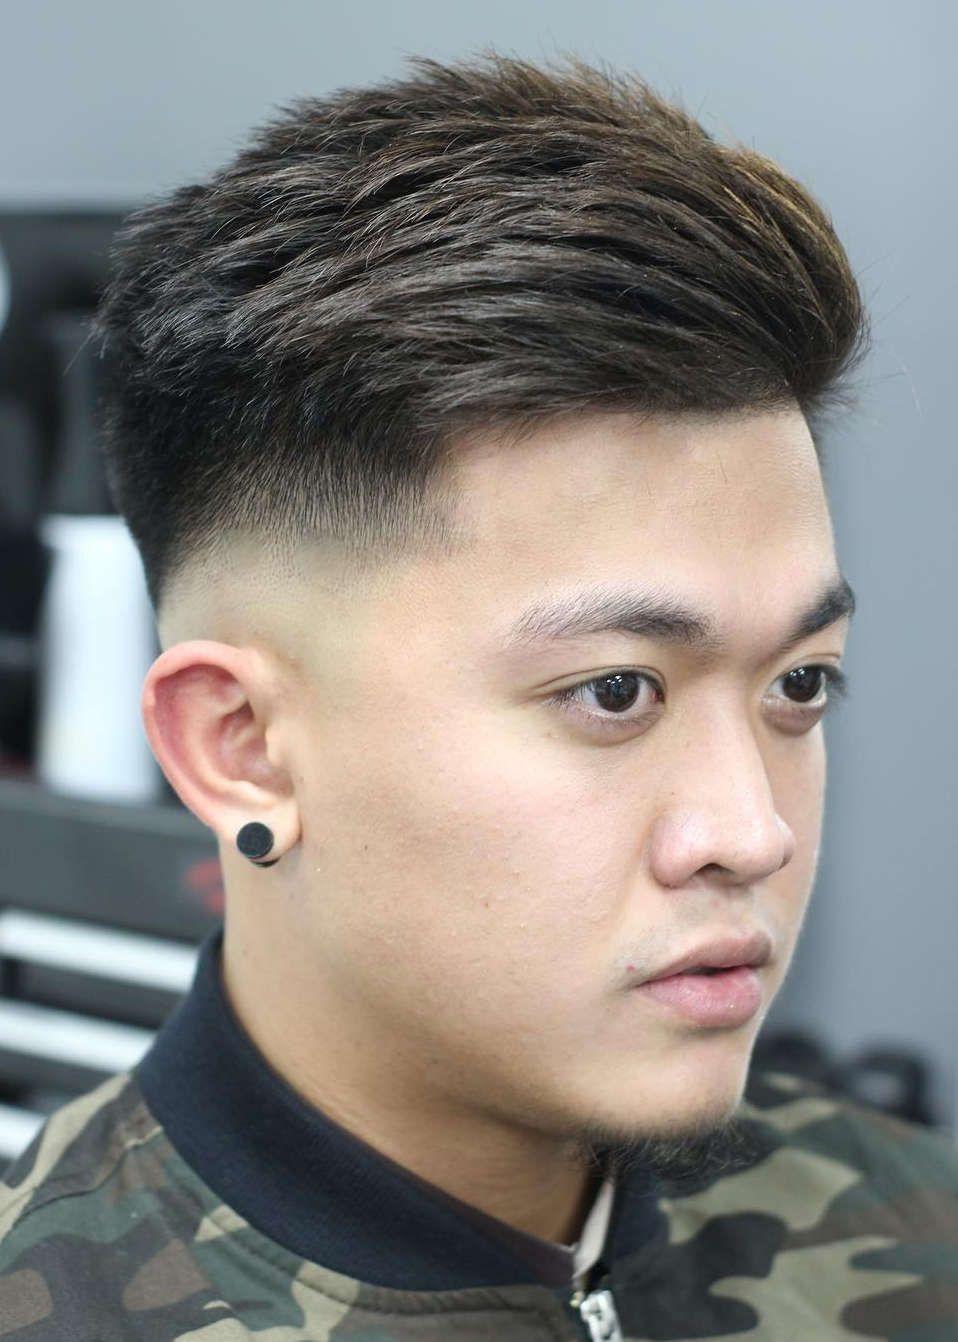 Top 30 Trendy Asian Men Hairstyles 2020 Asian Men Hairstyle Cool Hairstyles For Men Asian Hair